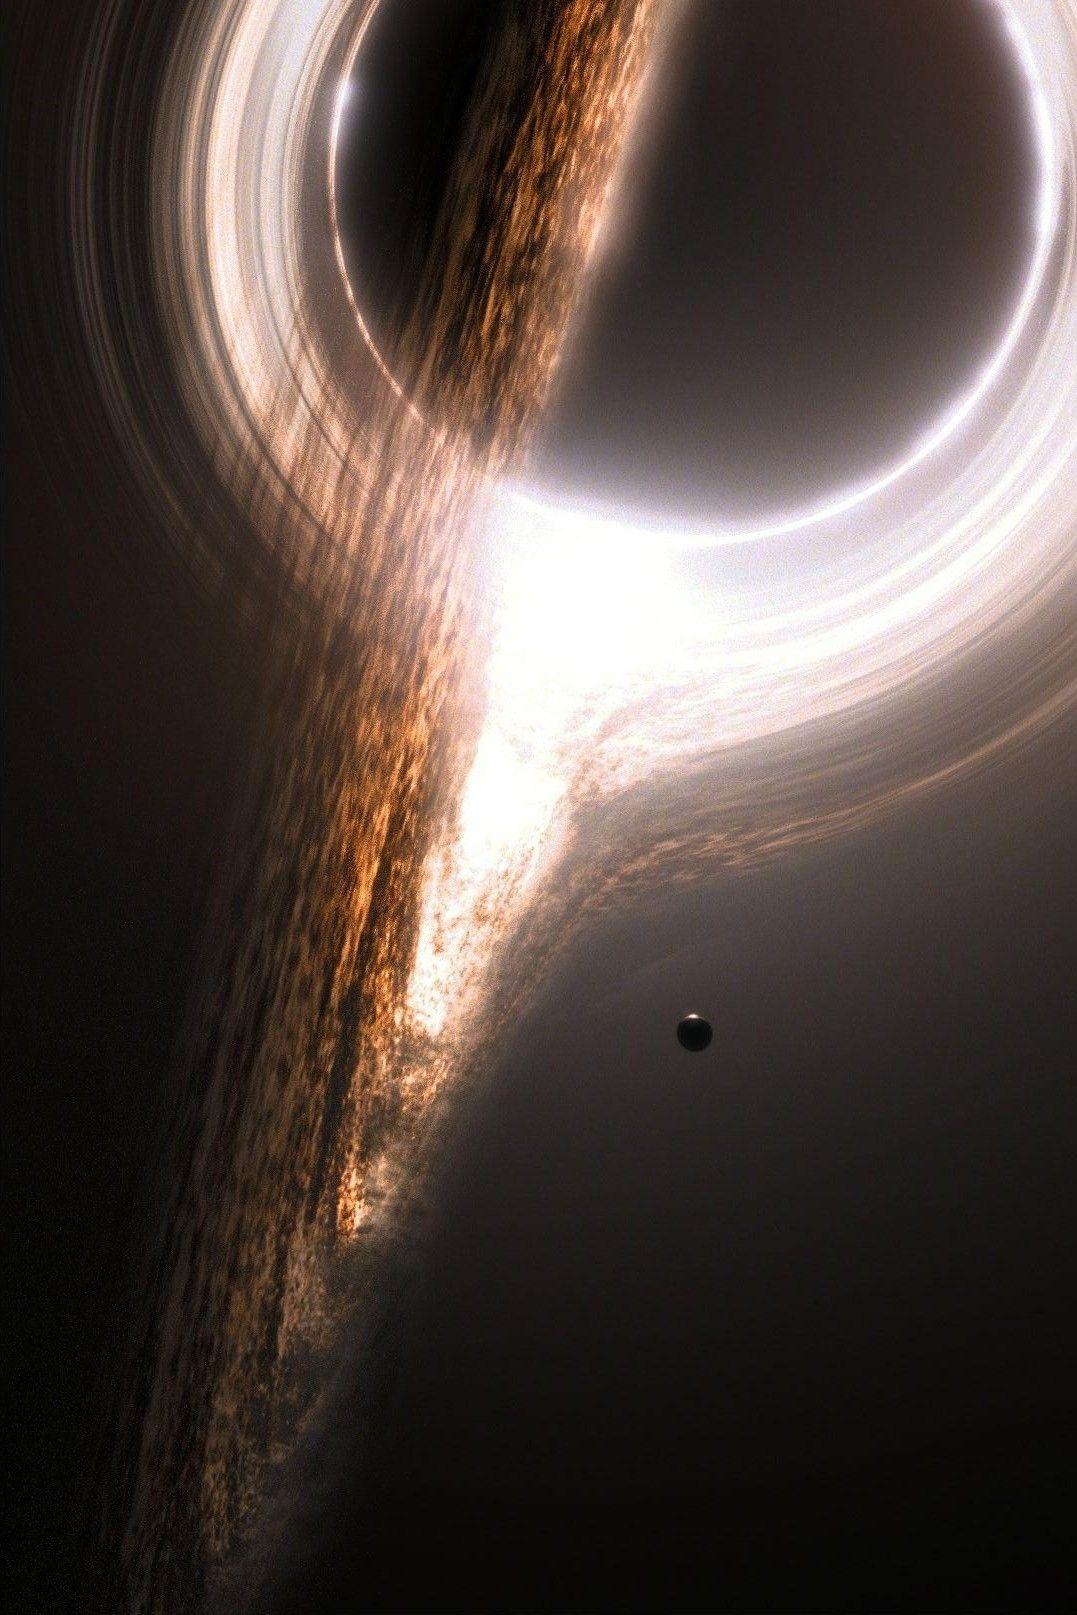 Taz Universe Aesthetic Personal Rnorse Code Black Hole Wallpaper Wallpaper Space Interstellar